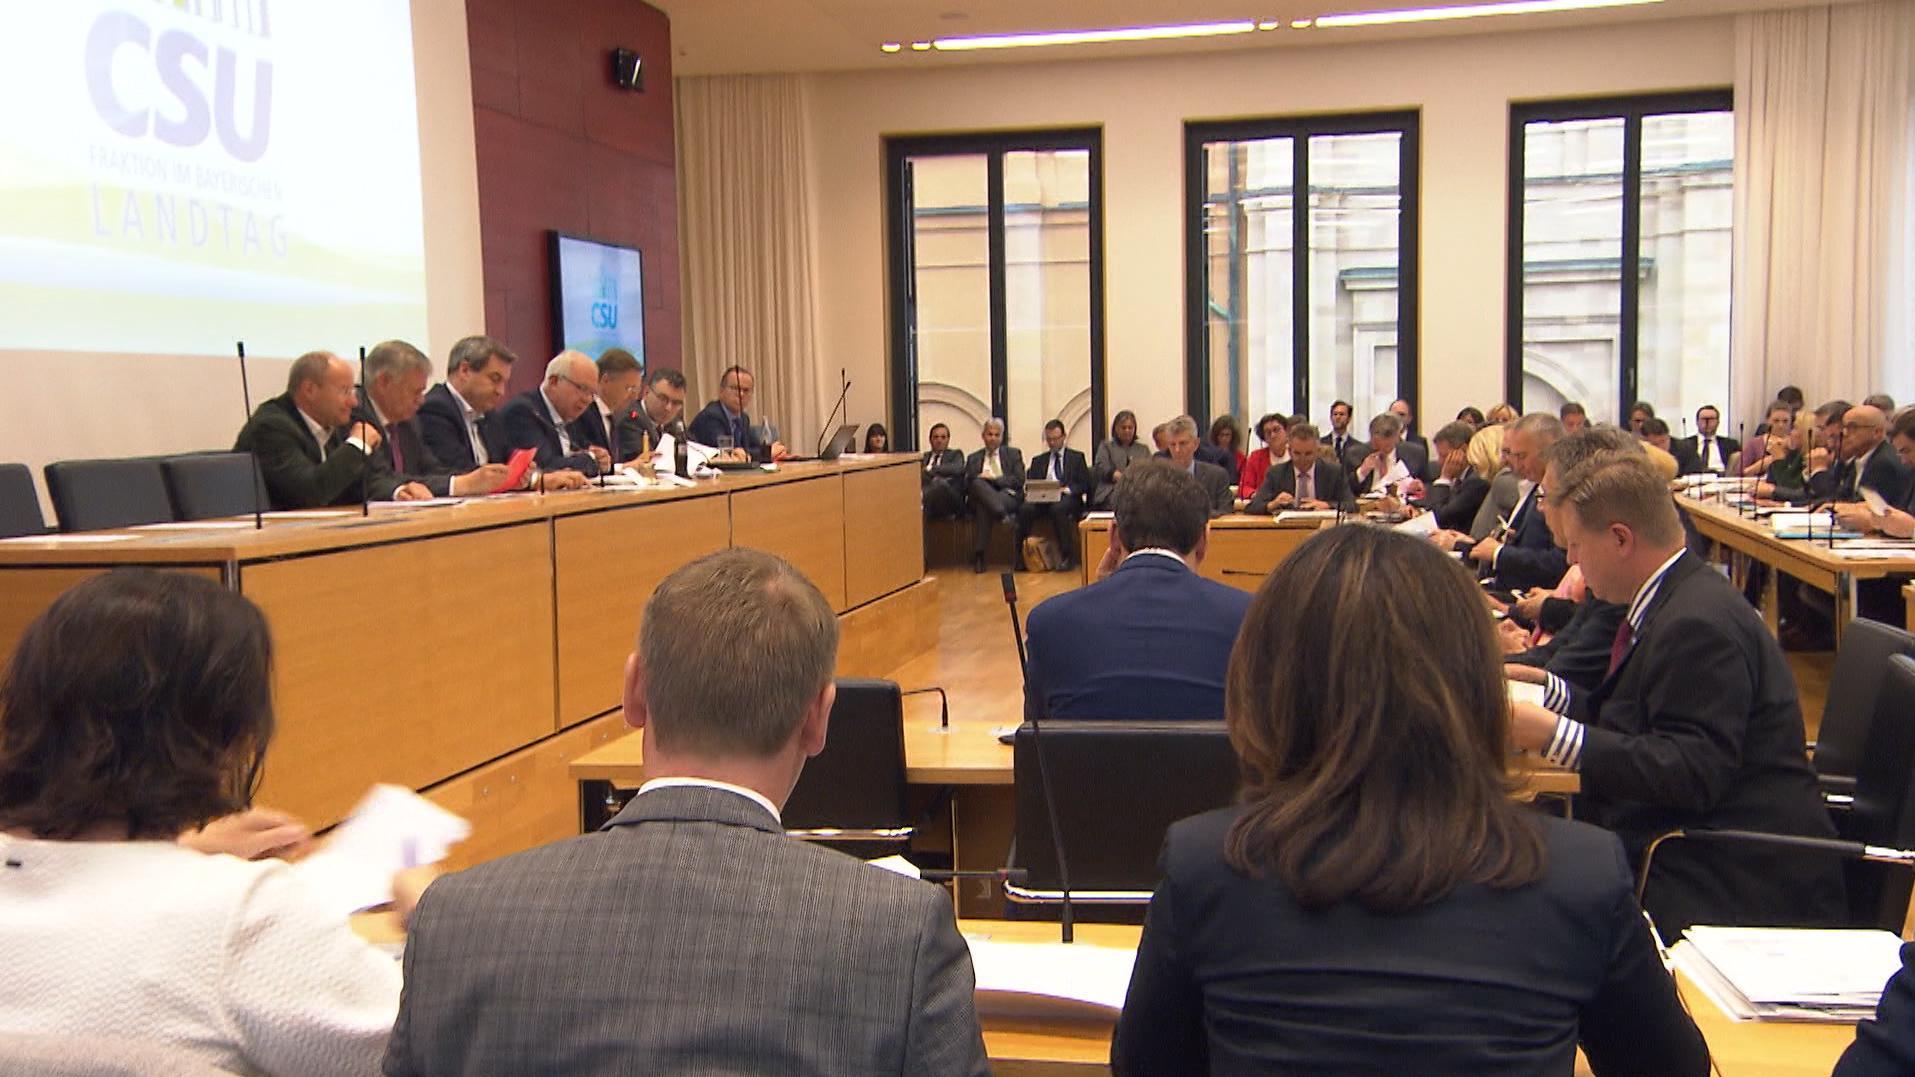 CSU-Landtagsfraktion